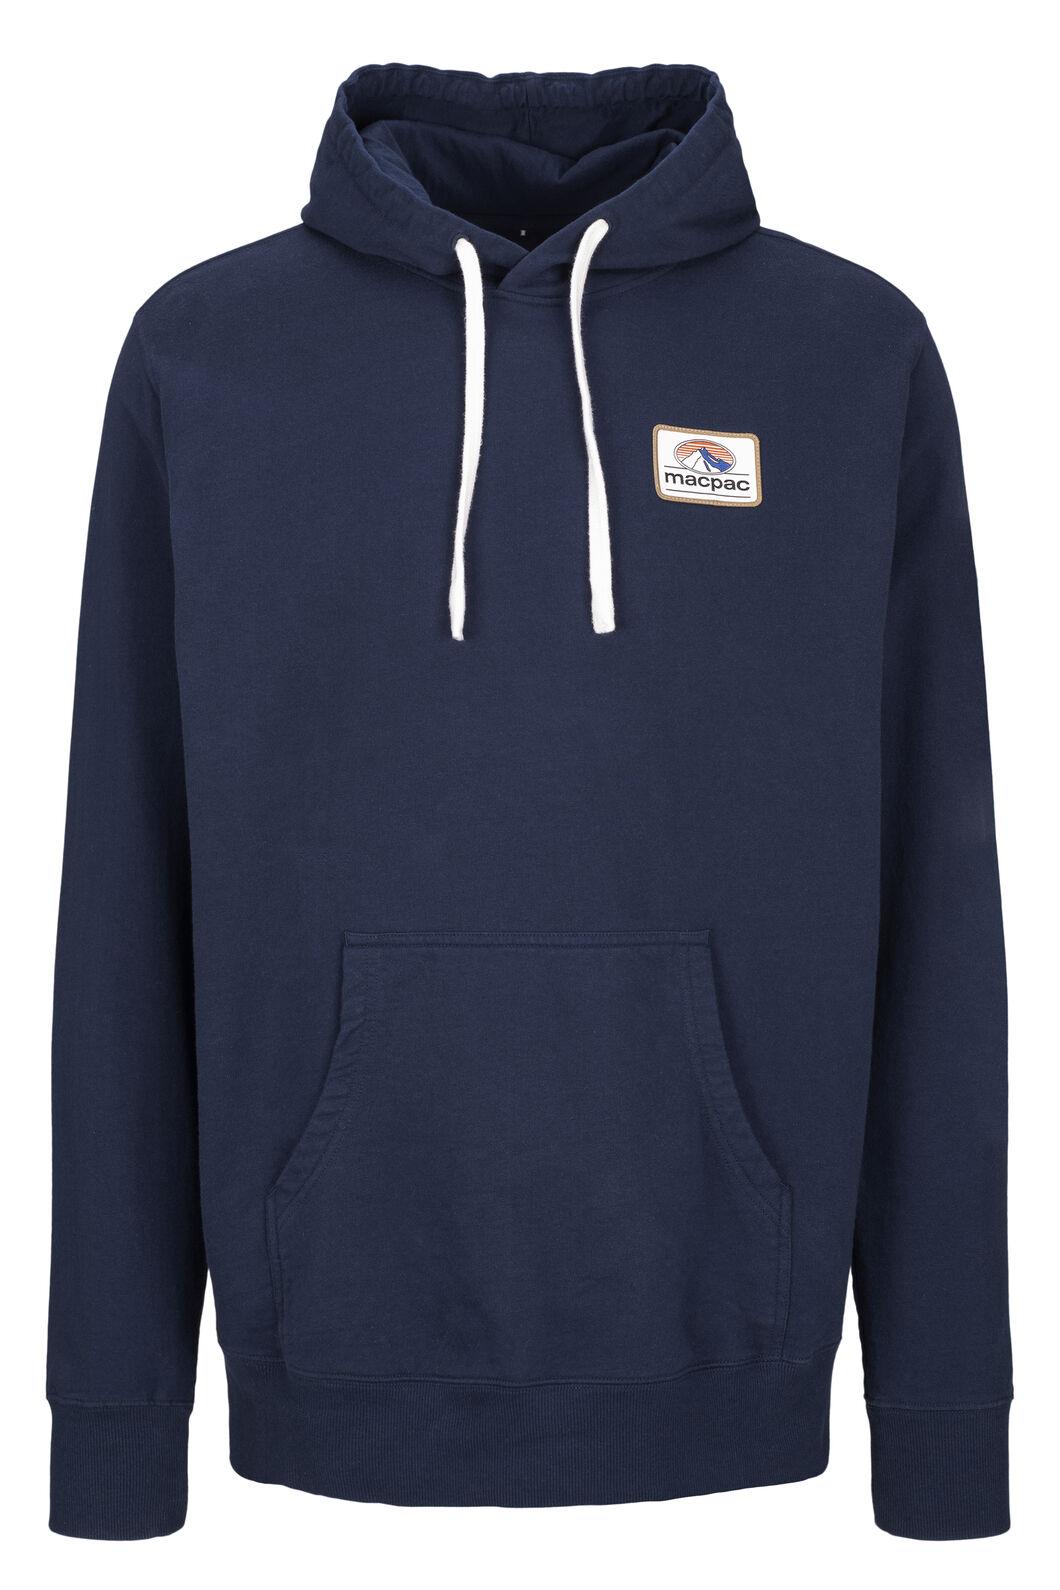 Macpac Organic Cotton Fairtrade Hooded Pullover — Men's, Black Iris Patch, hi-res